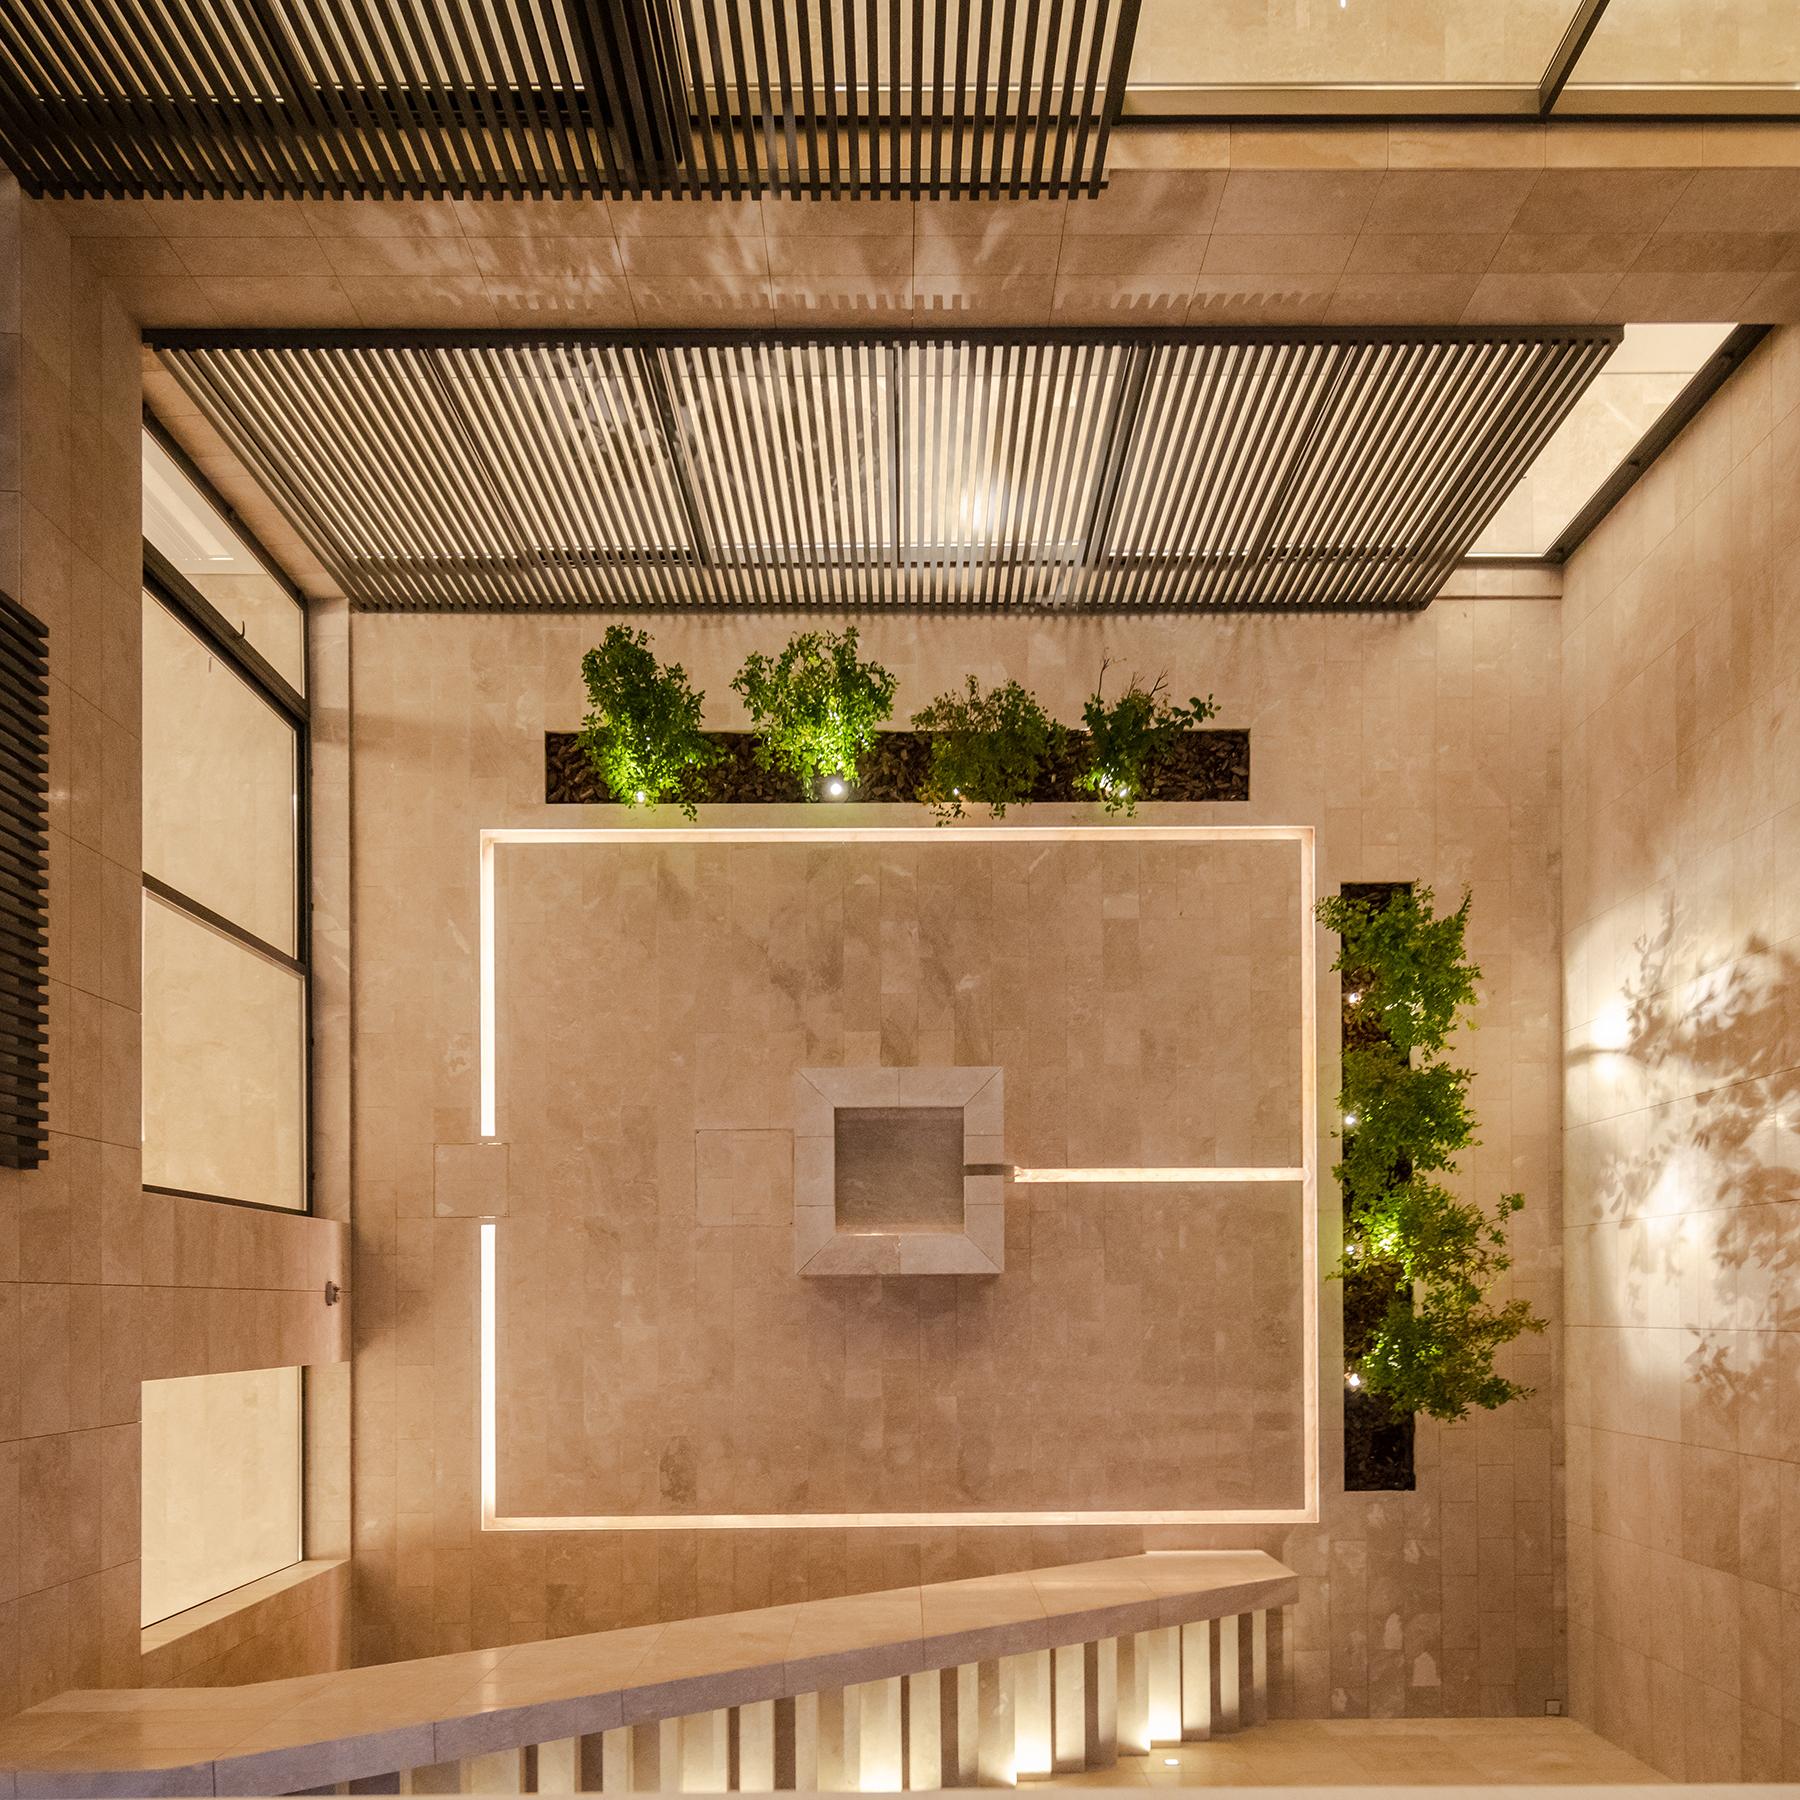 Open Courtyards In The House In Mishref Hkz Mena Design Magazine